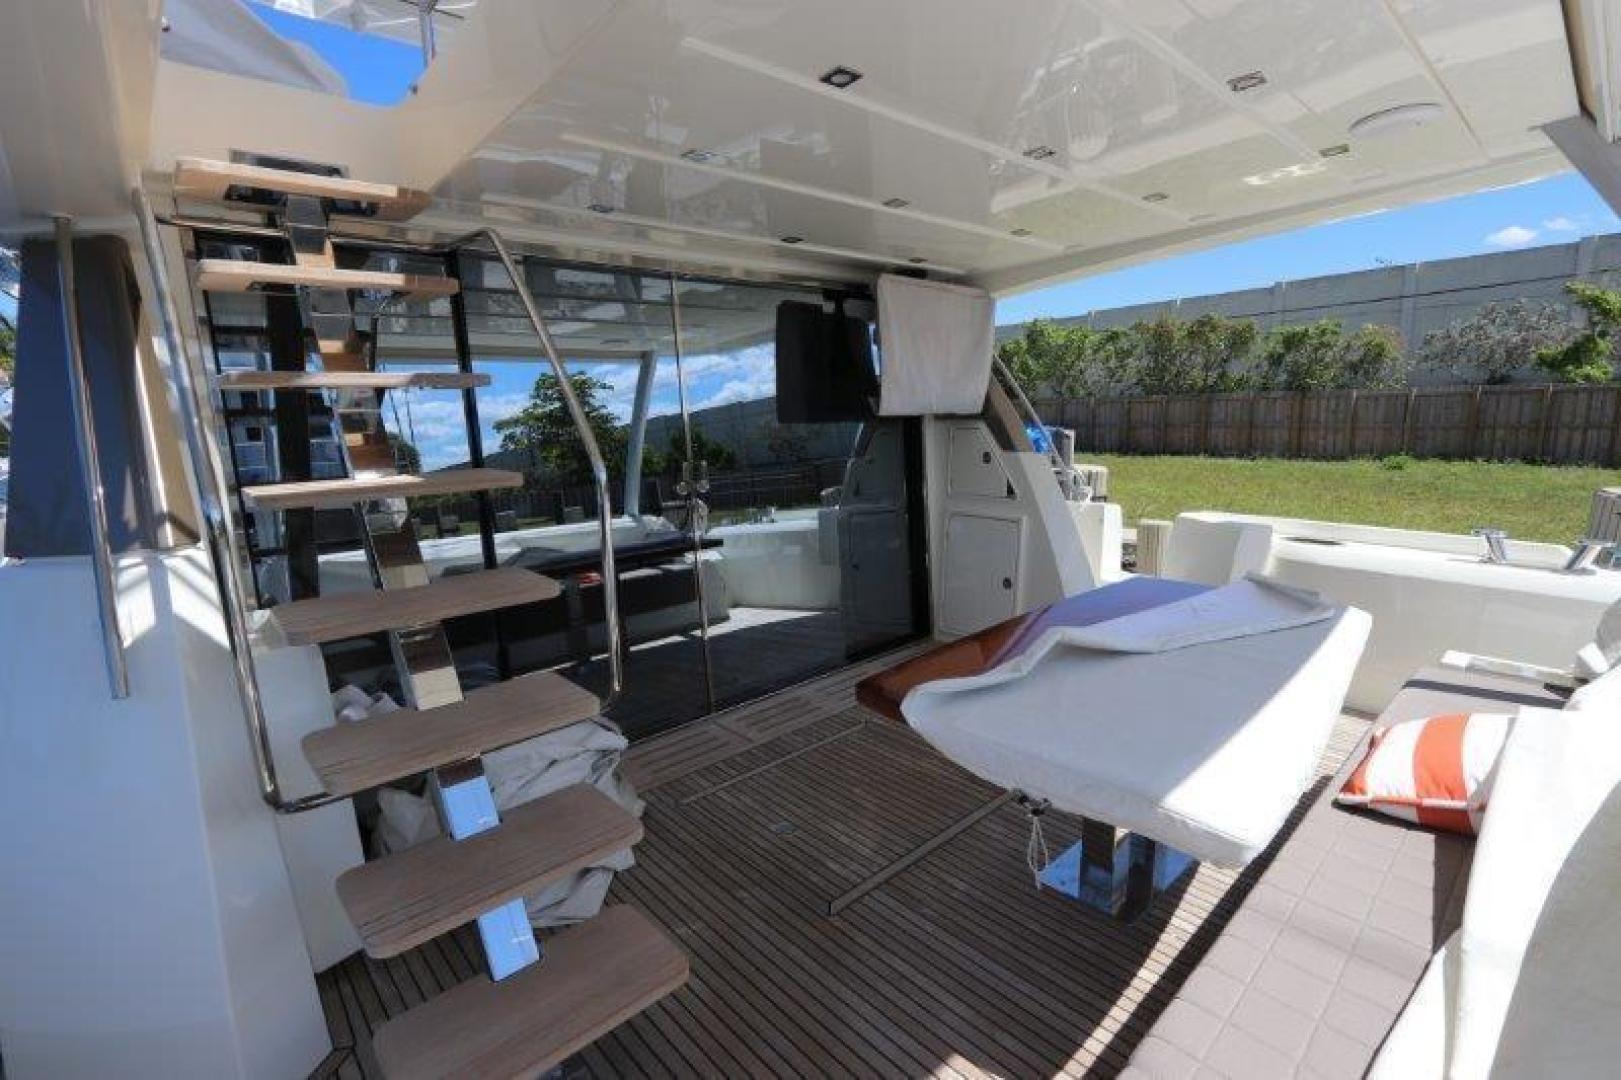 Prestige-Motoryacht 2017-Breathe Easy Fort Lauderdale-Florida-United States-1303847   Thumbnail